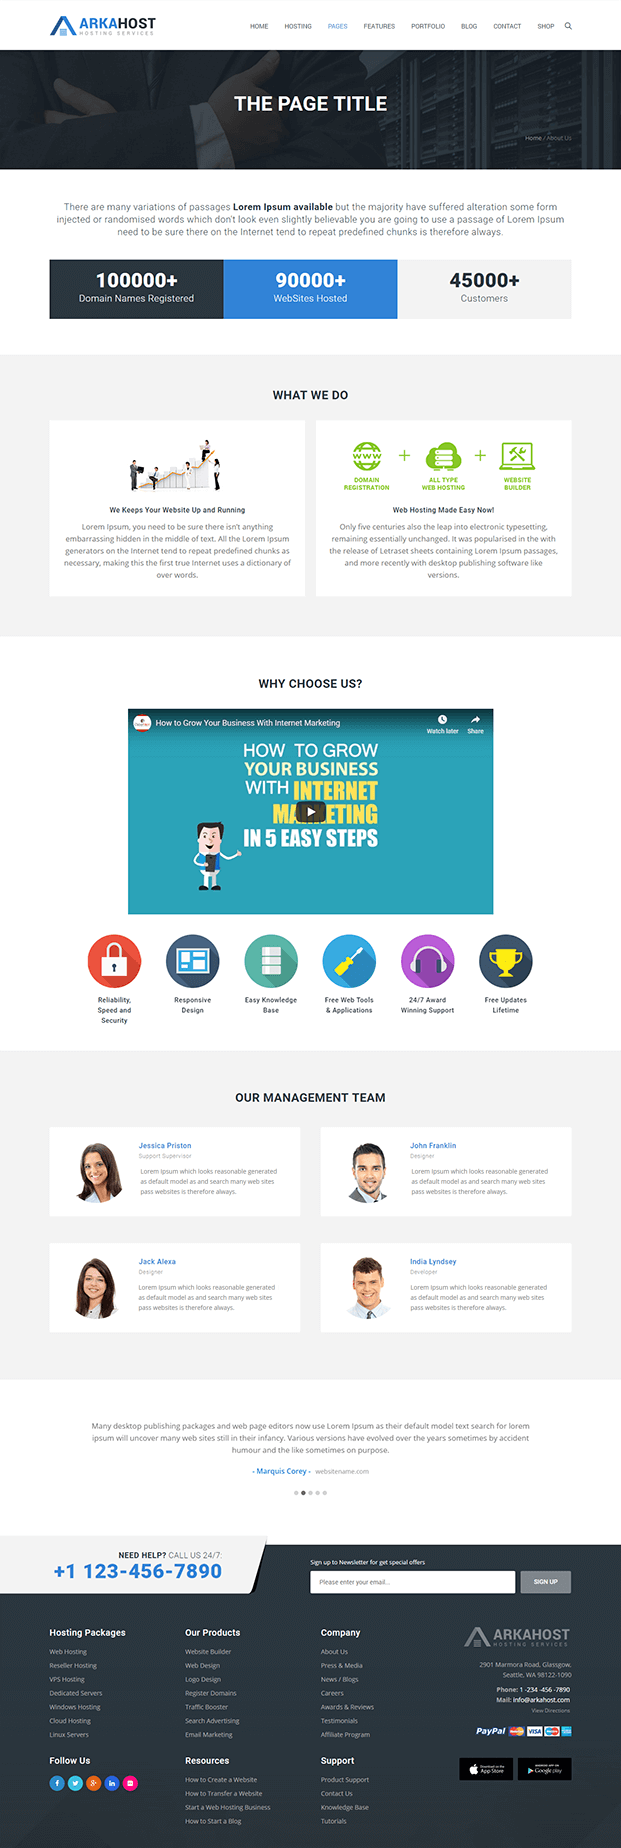 About Us - Best WordPress Hosting Theme